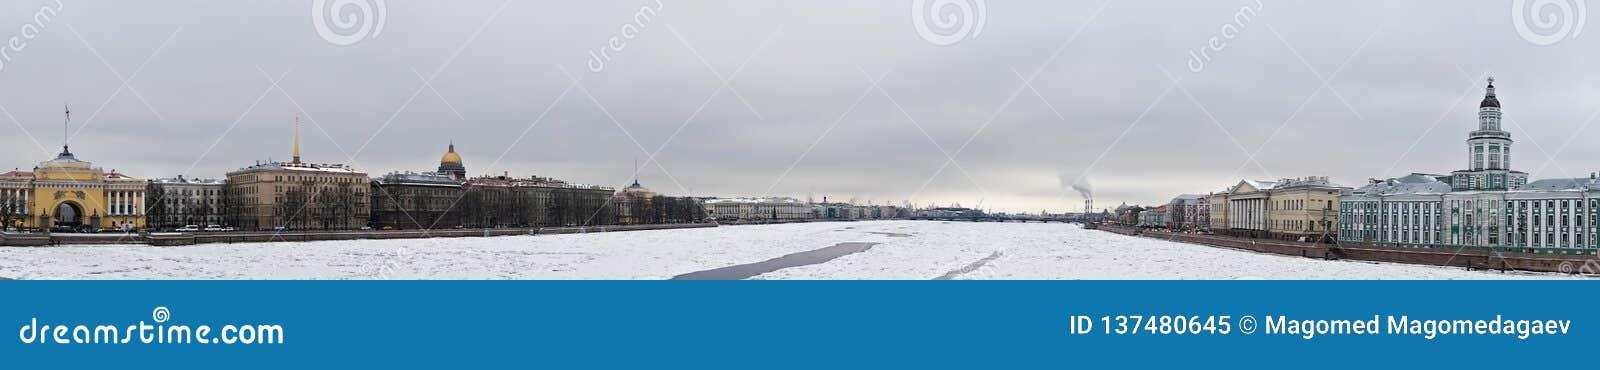 Ice on Neva river panorama. Panoramic shot of ice on Neva river between Palace and Annuncuation bridges, Saint Petersburg, Russia royalty free stock photo